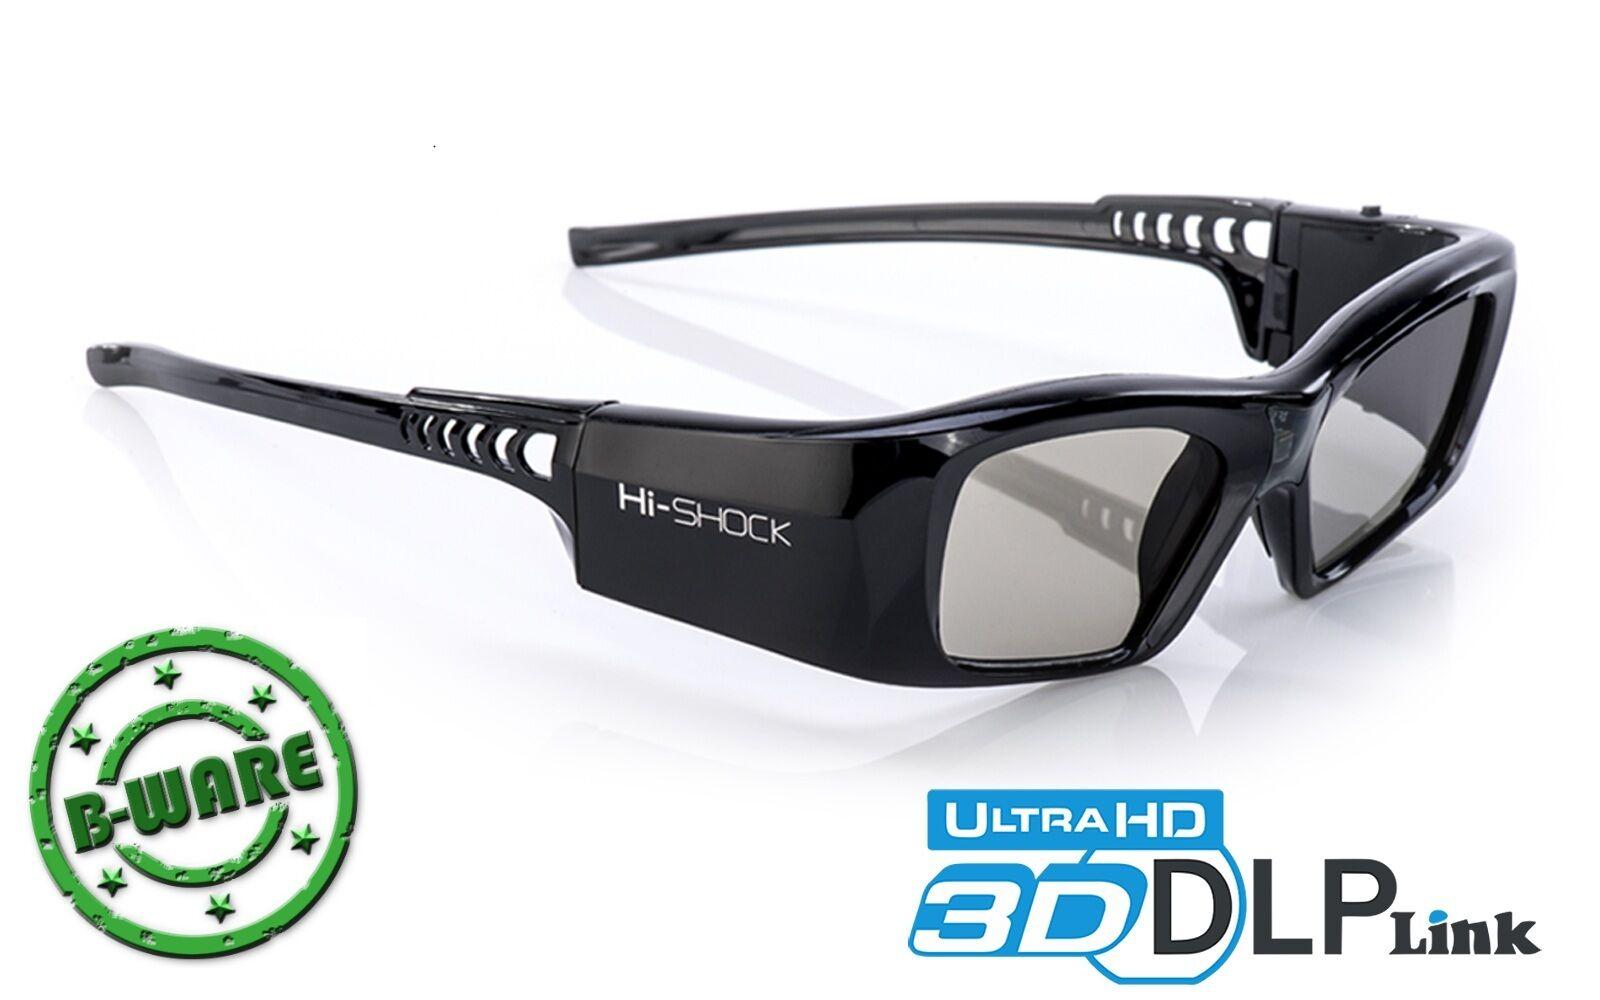 3D-Brille DLP Pro 7G Black Diamond   DLP-Link für Beamer BenQ Optoma Hi-SHOCK®